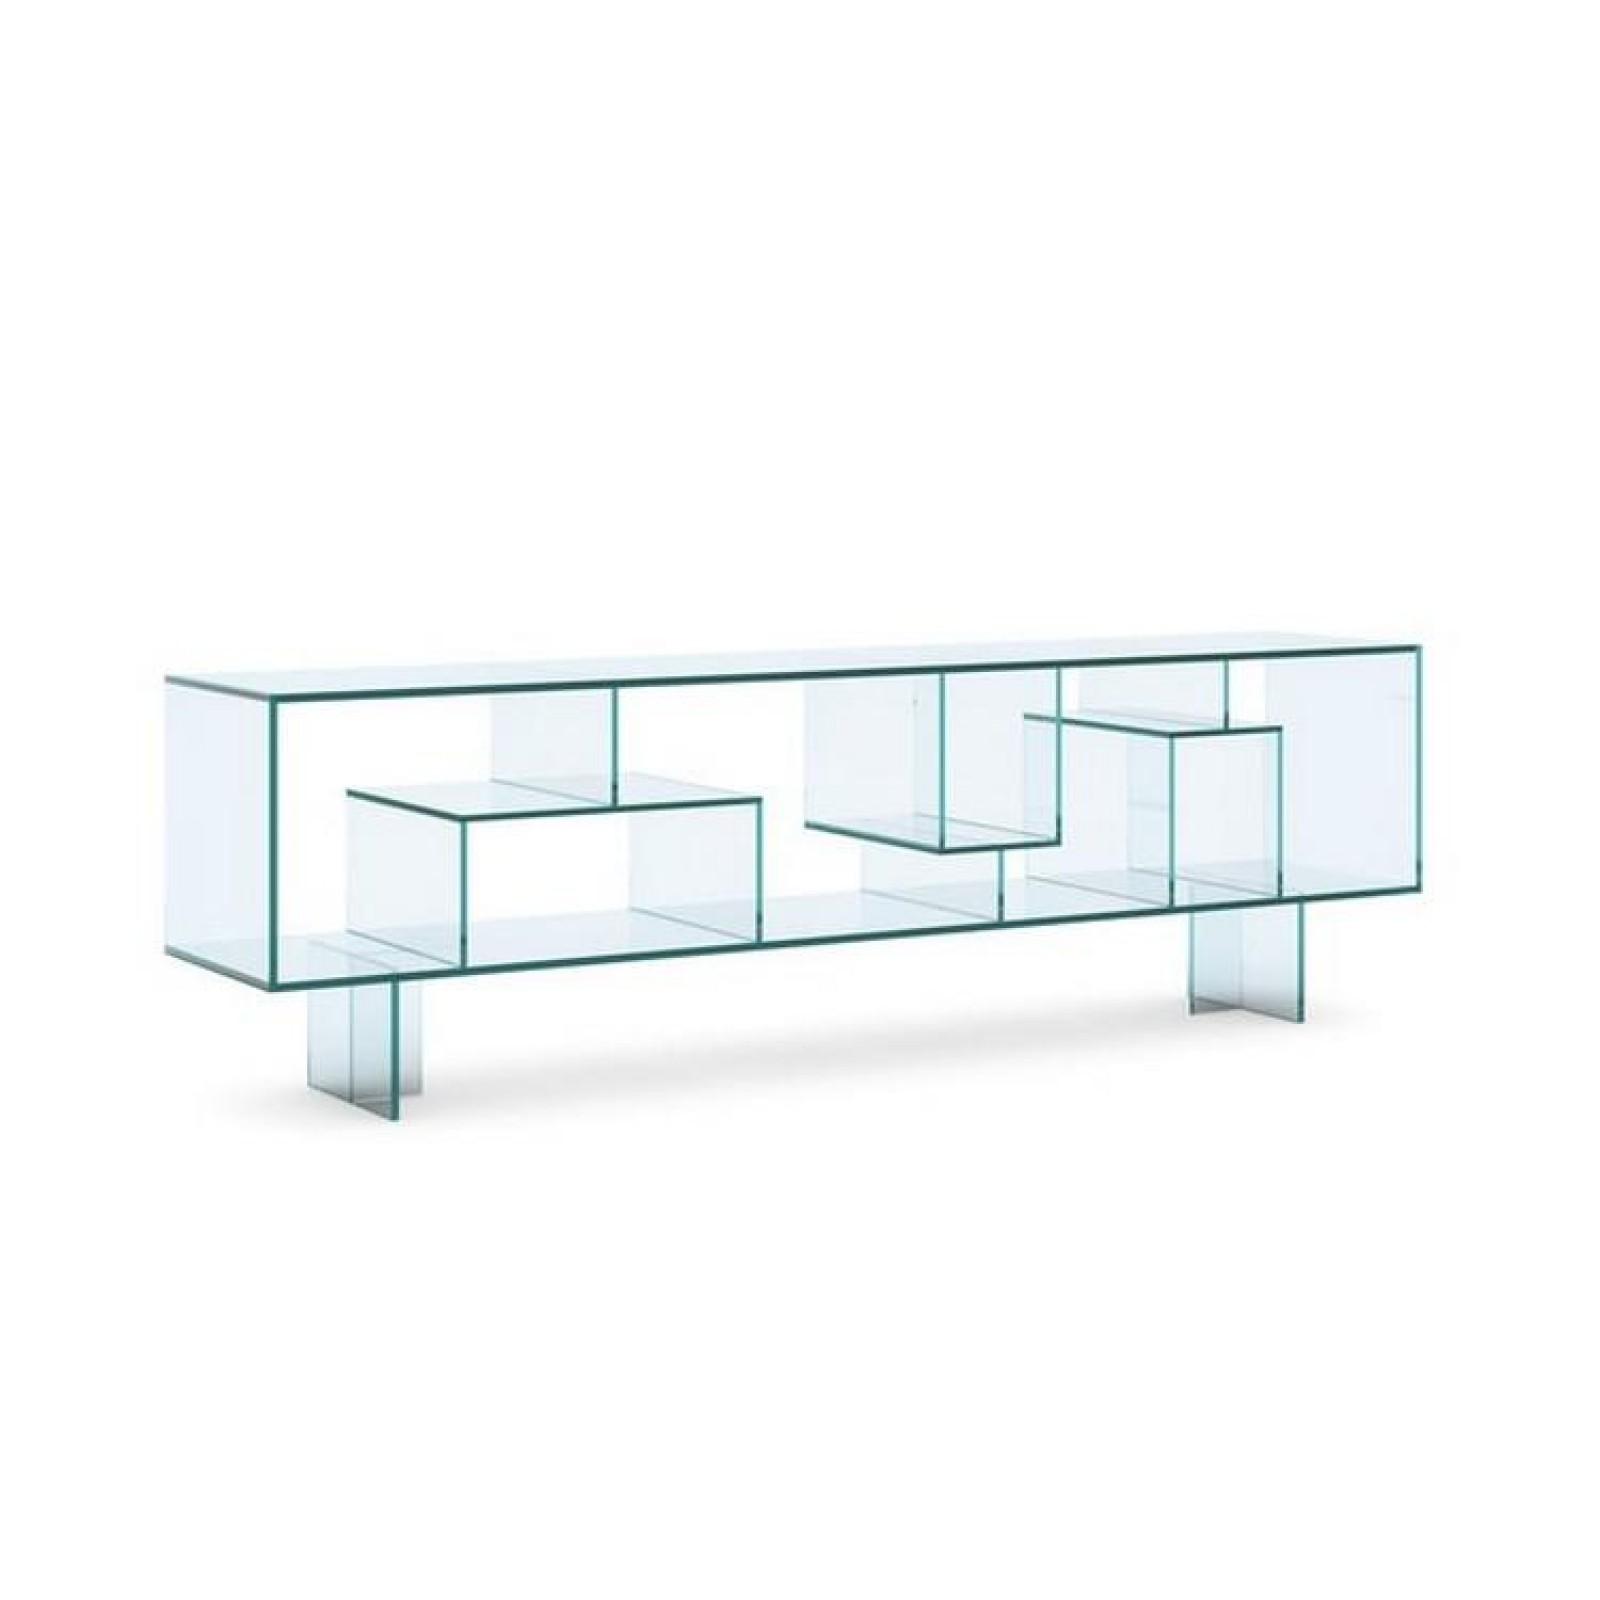 Liber M Glass Sideboard / Display Unit - Tonelli Design